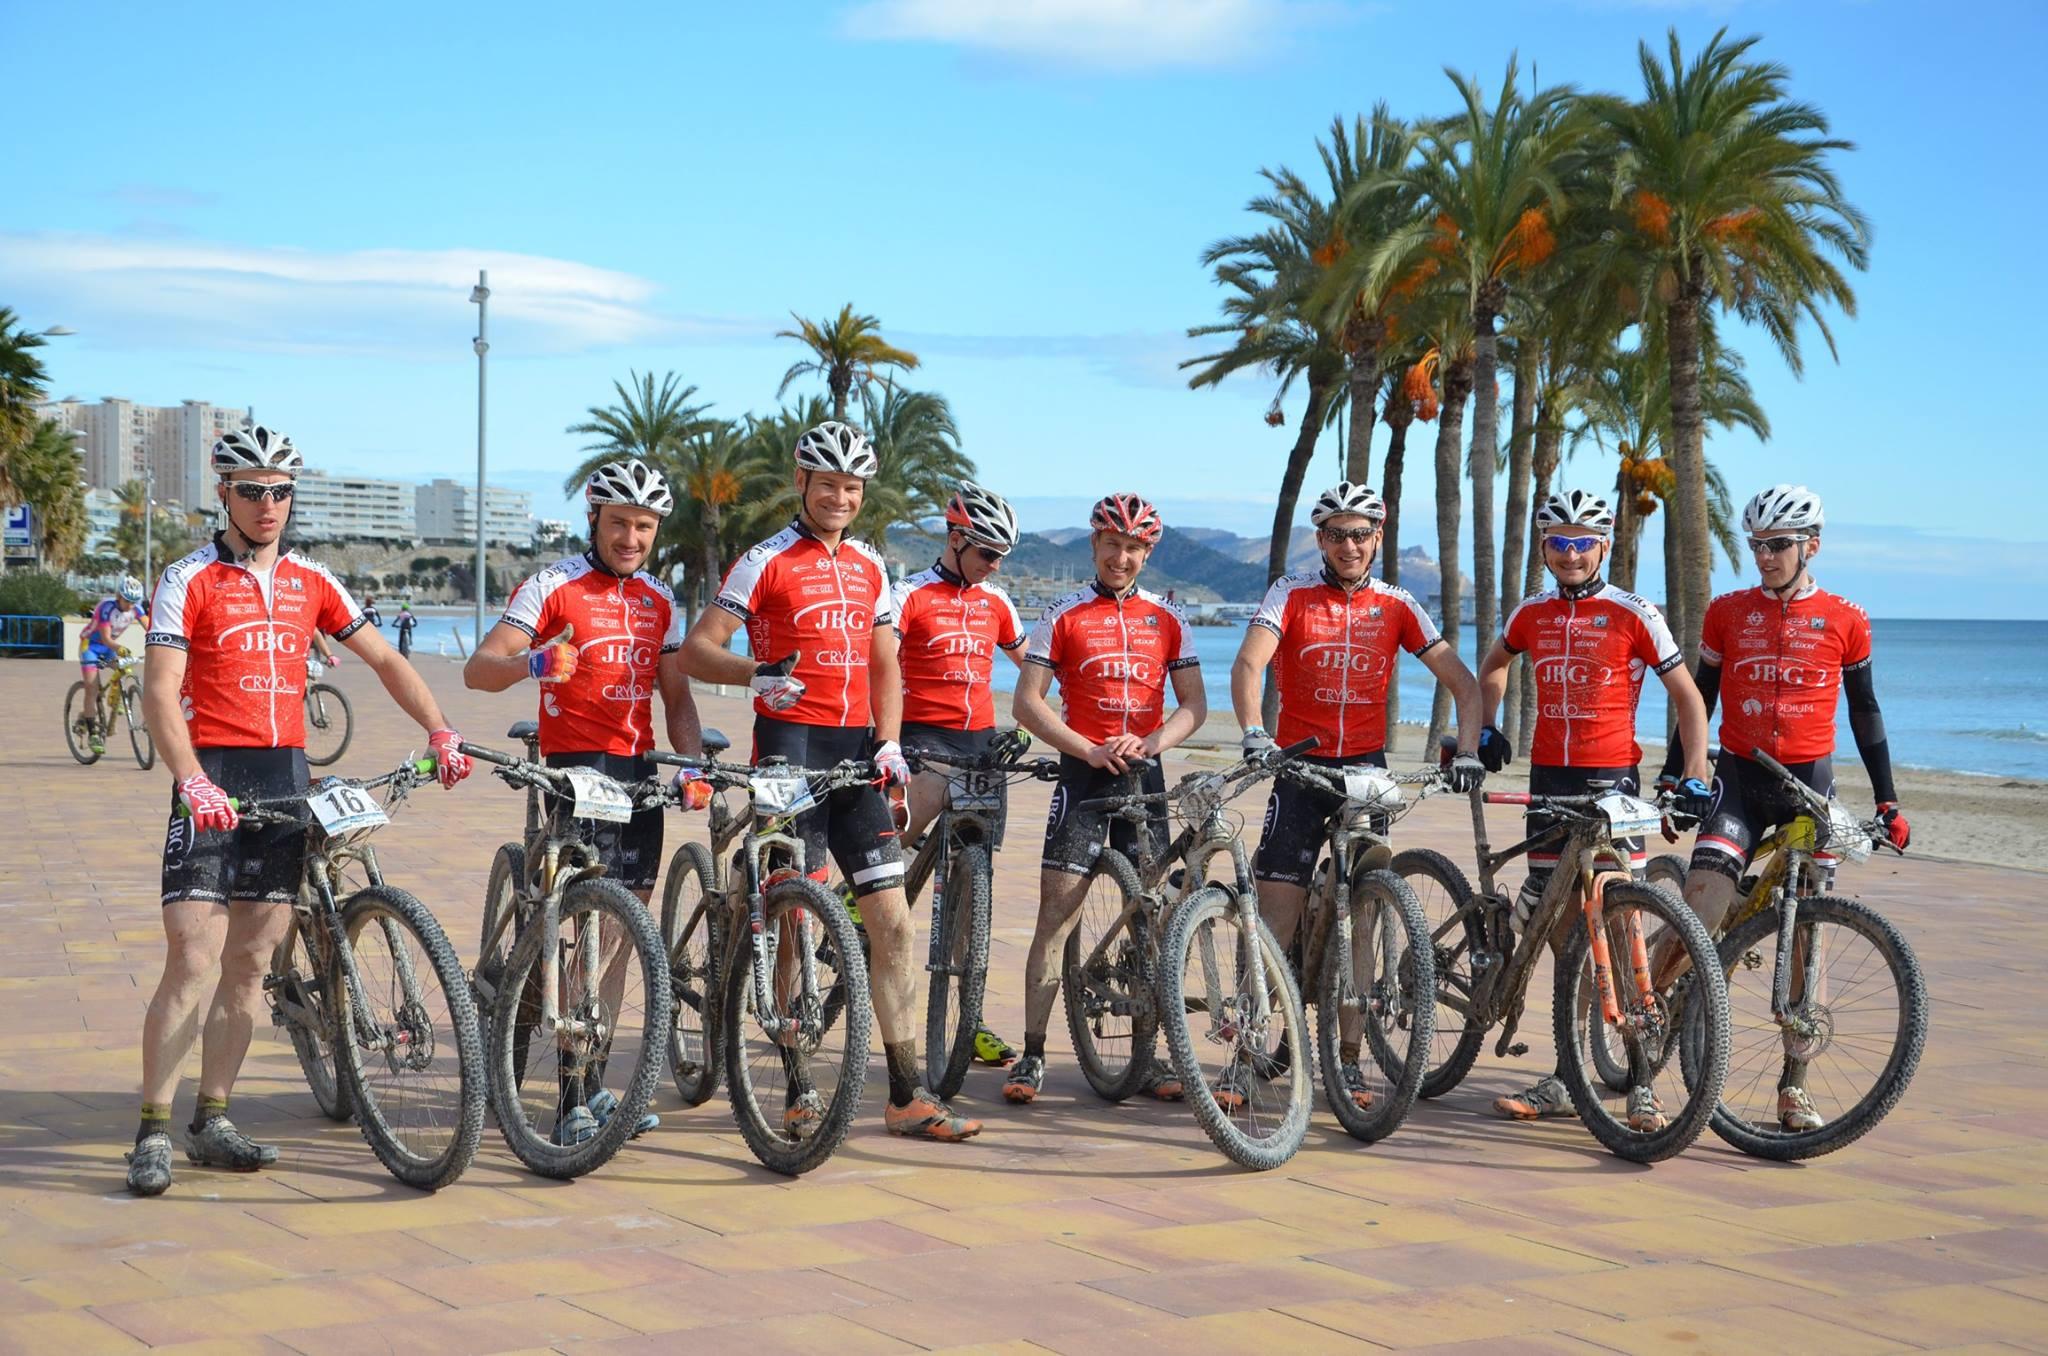 JBG2 Team – Costa Blanca Bike Race, Etap III